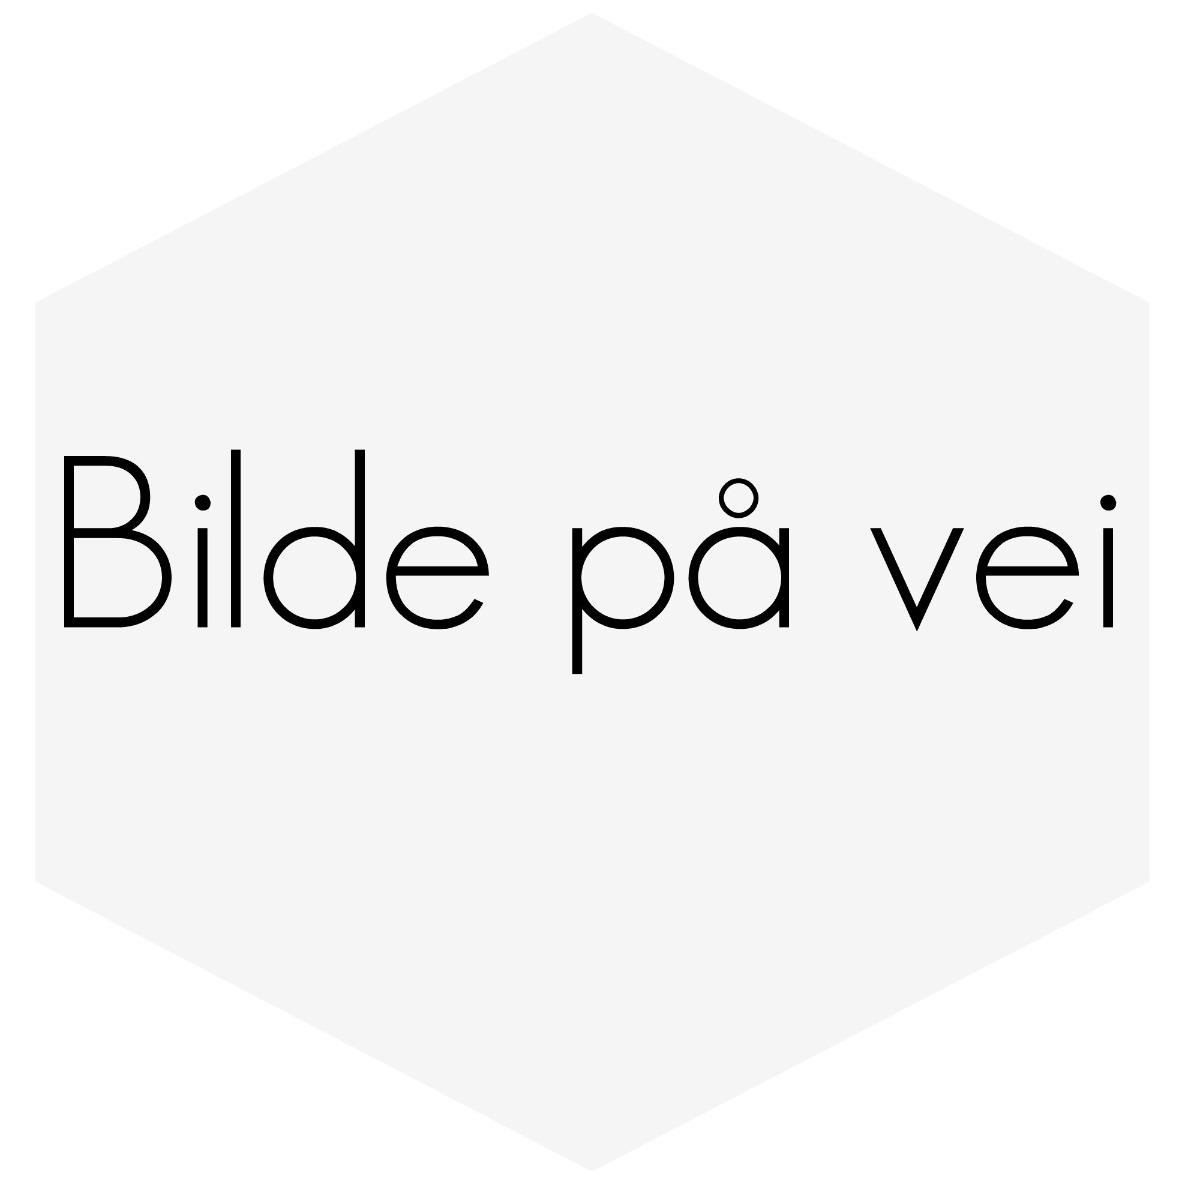 "SILIKONSLANGE DESIMETERVARE BLÅ 3,5"" (89MM)"